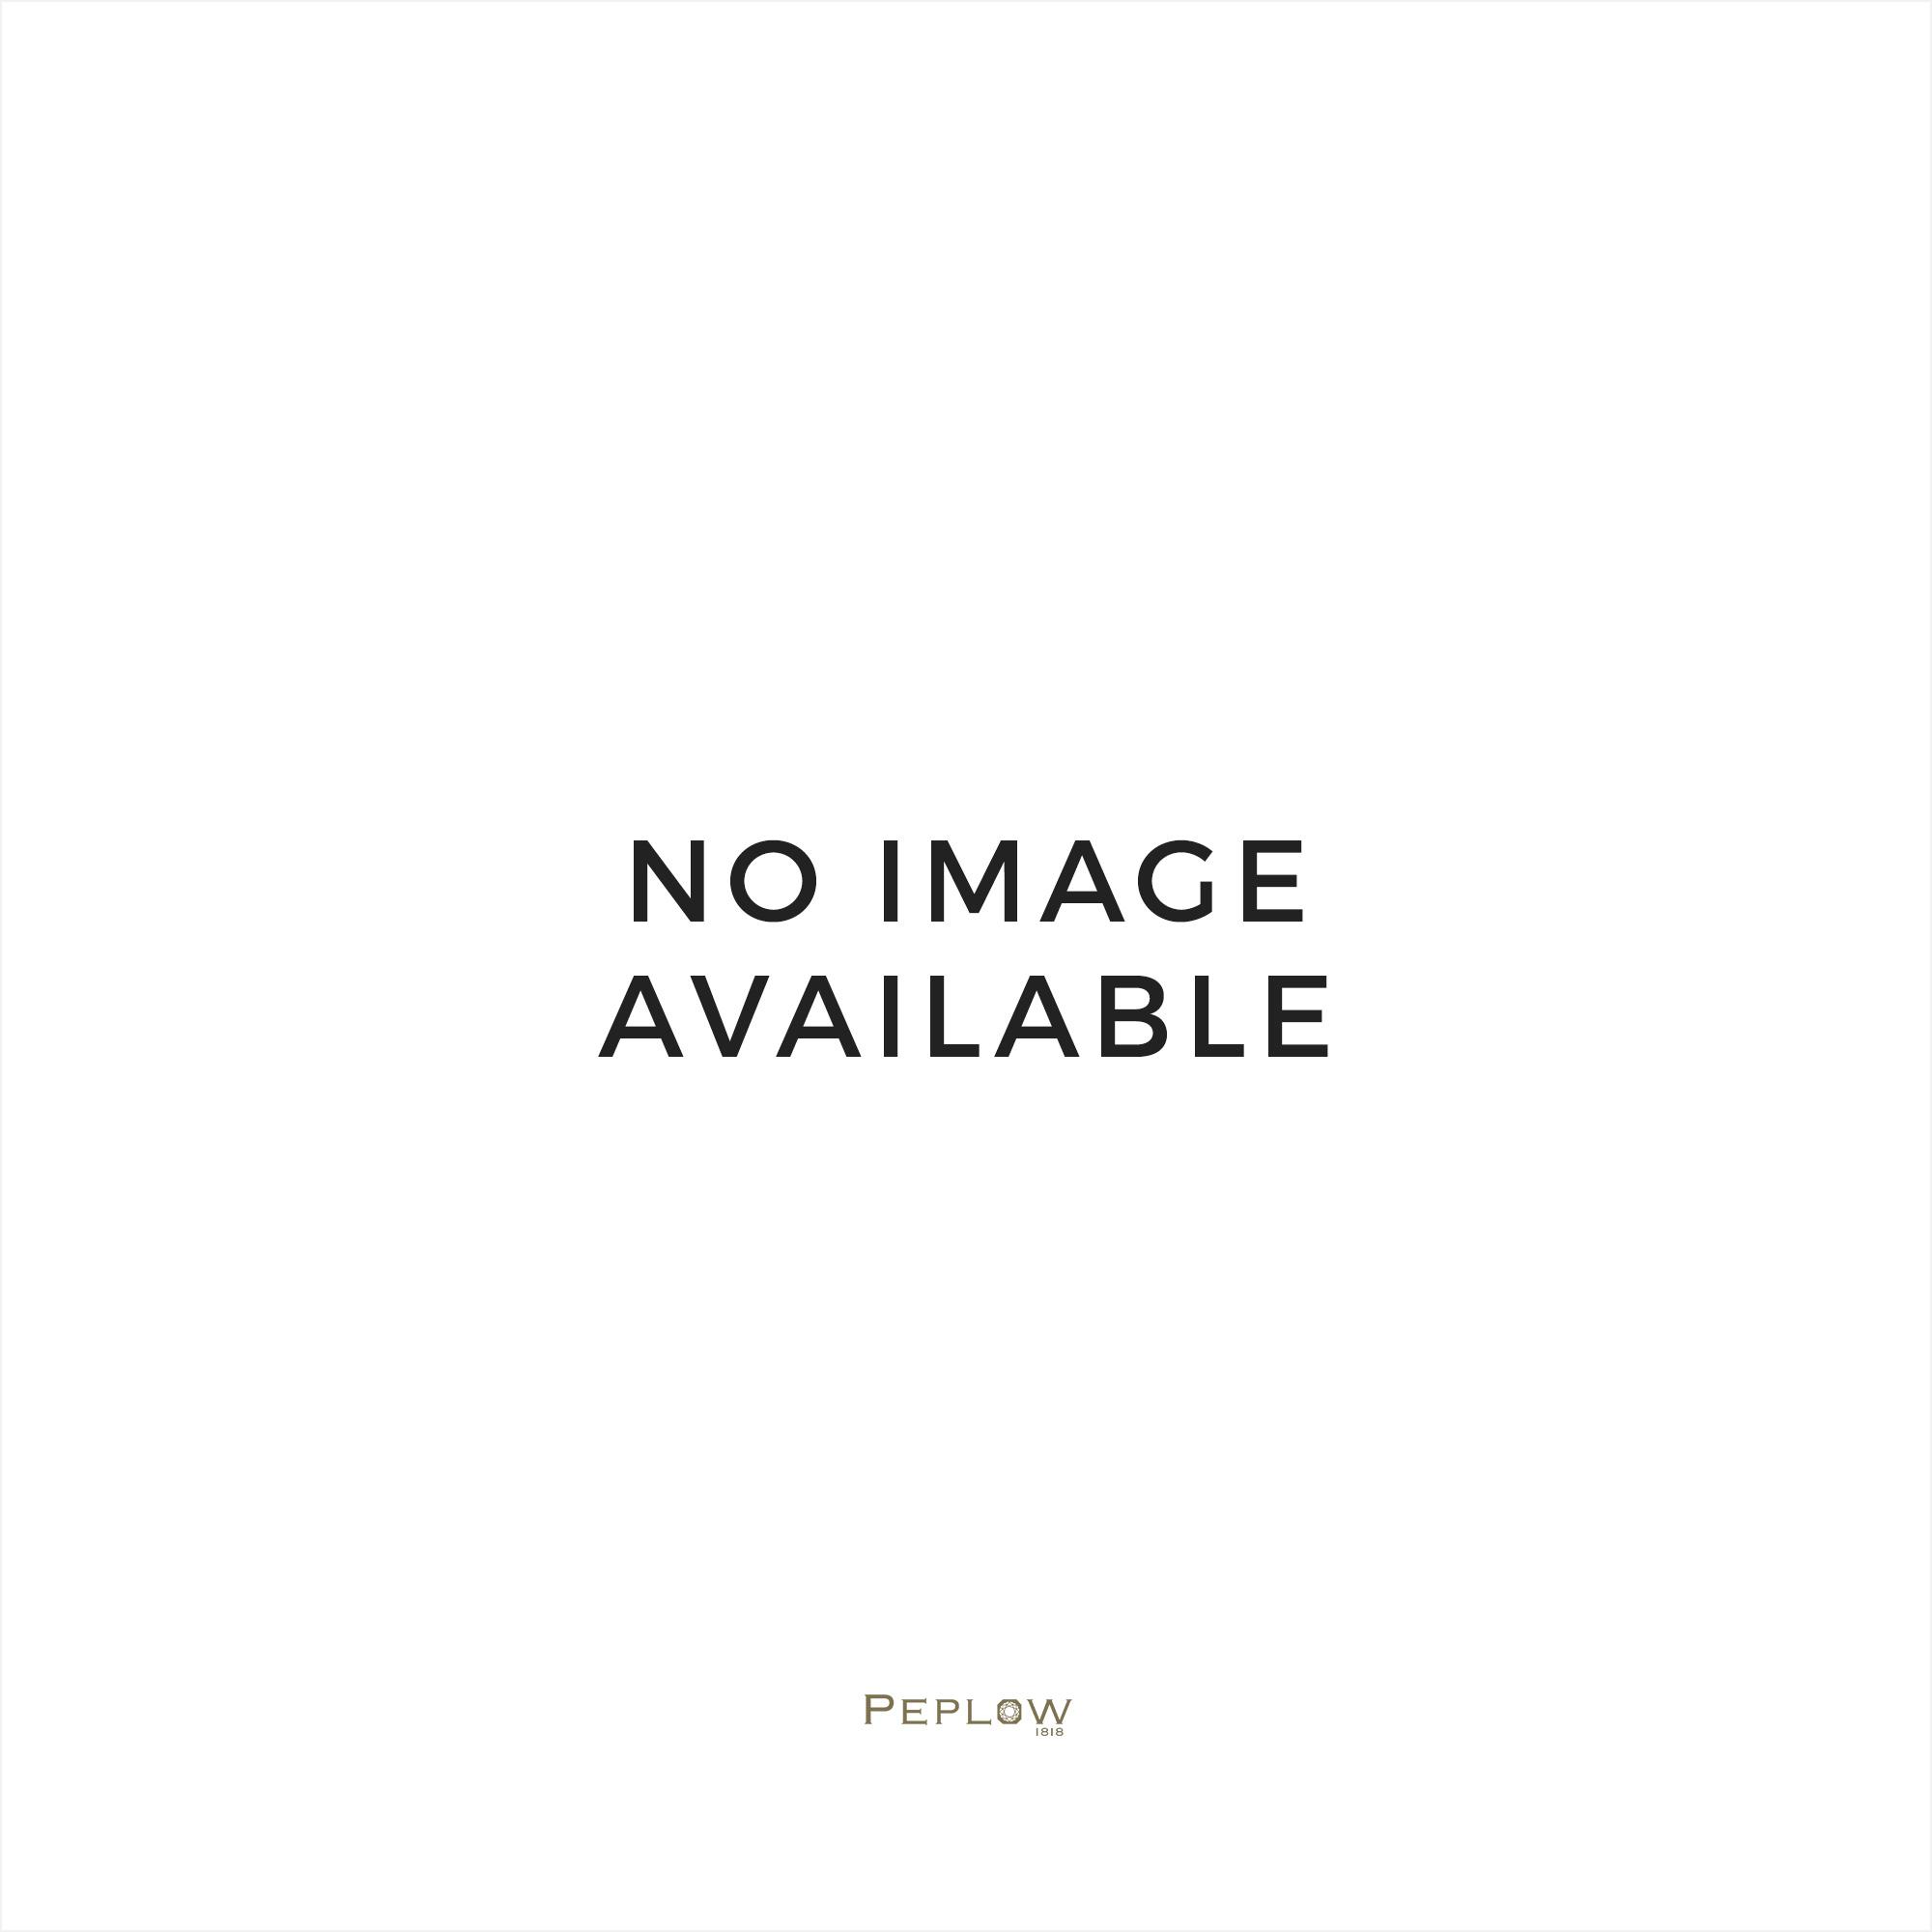 Rolex Watches Gents steel Rolex Explorer 1 watch, 114270